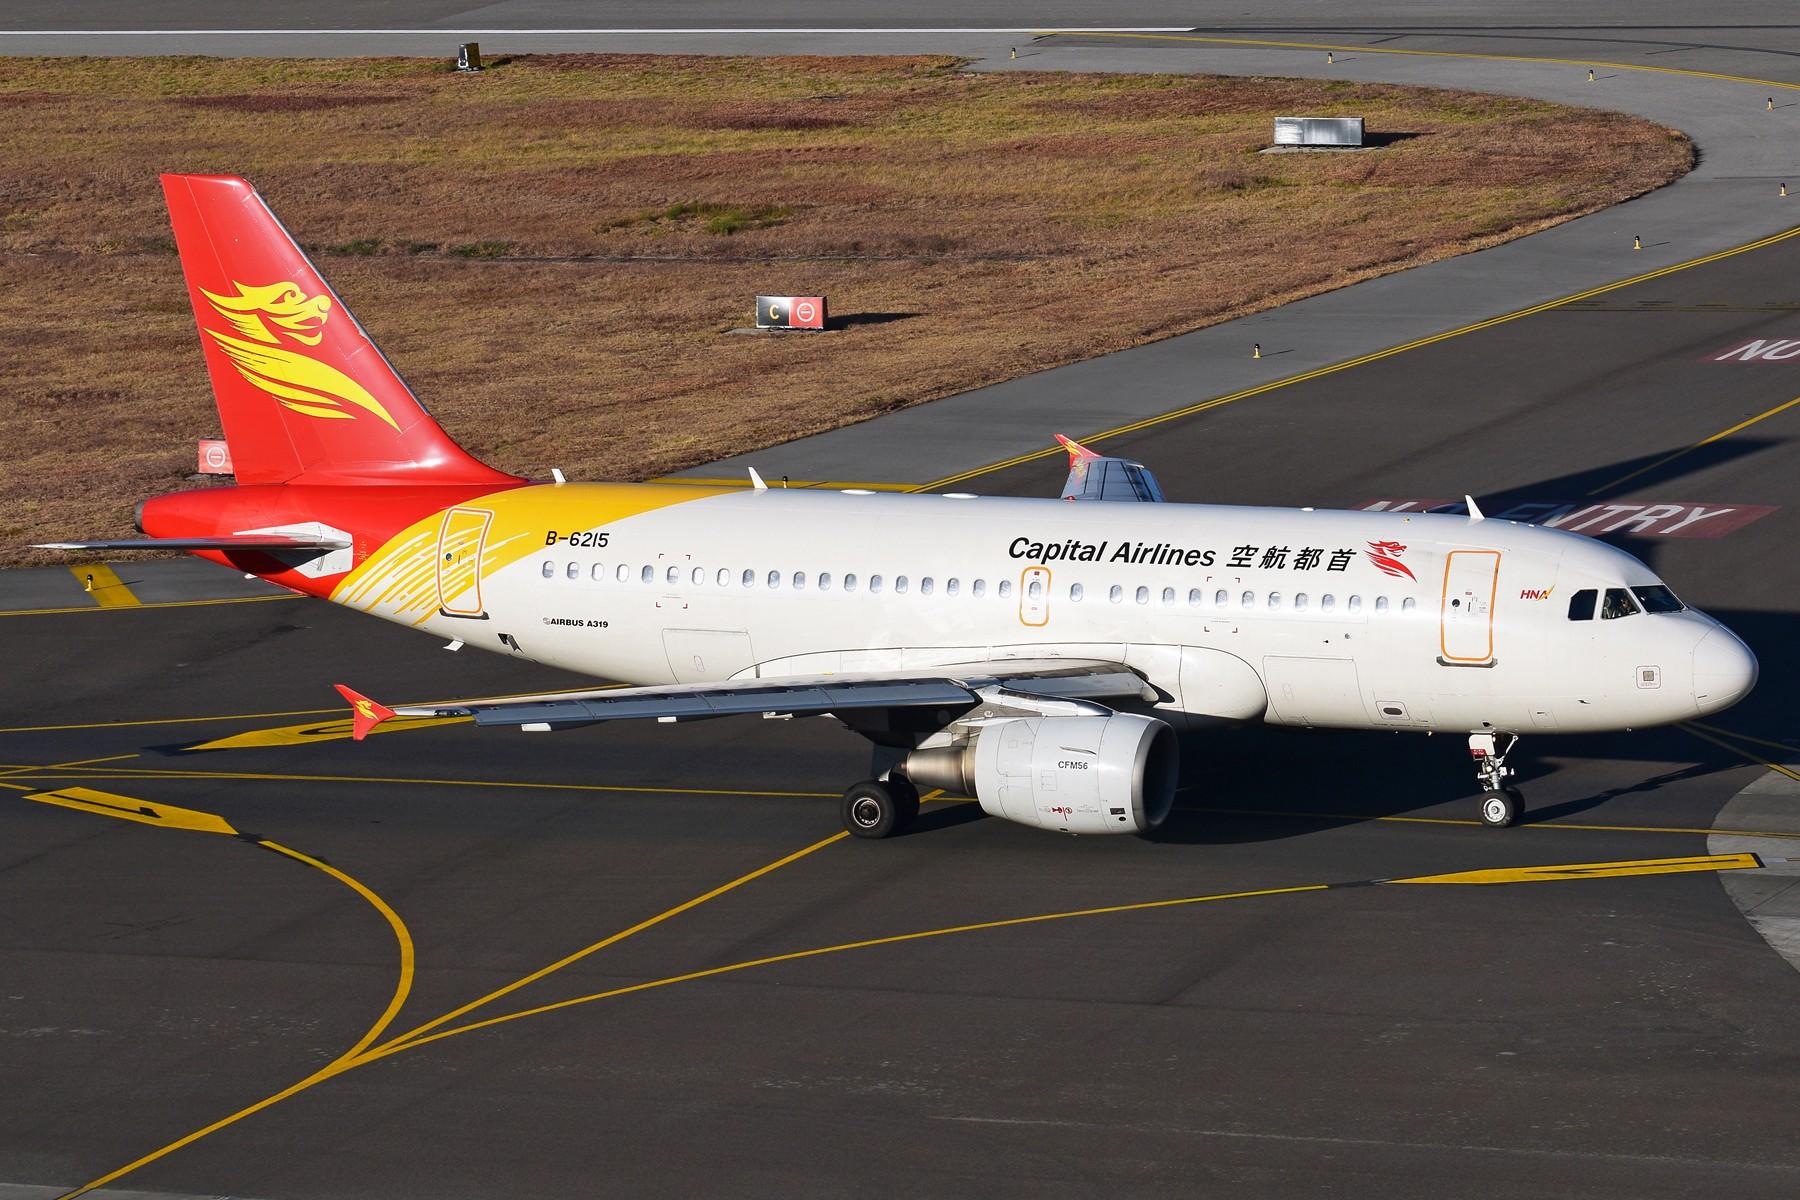 Re:[原创]补发的拍机游记---Day Trip for 丽江三义 AIRBUS A319-100 B-6215 中国丽江三义机场